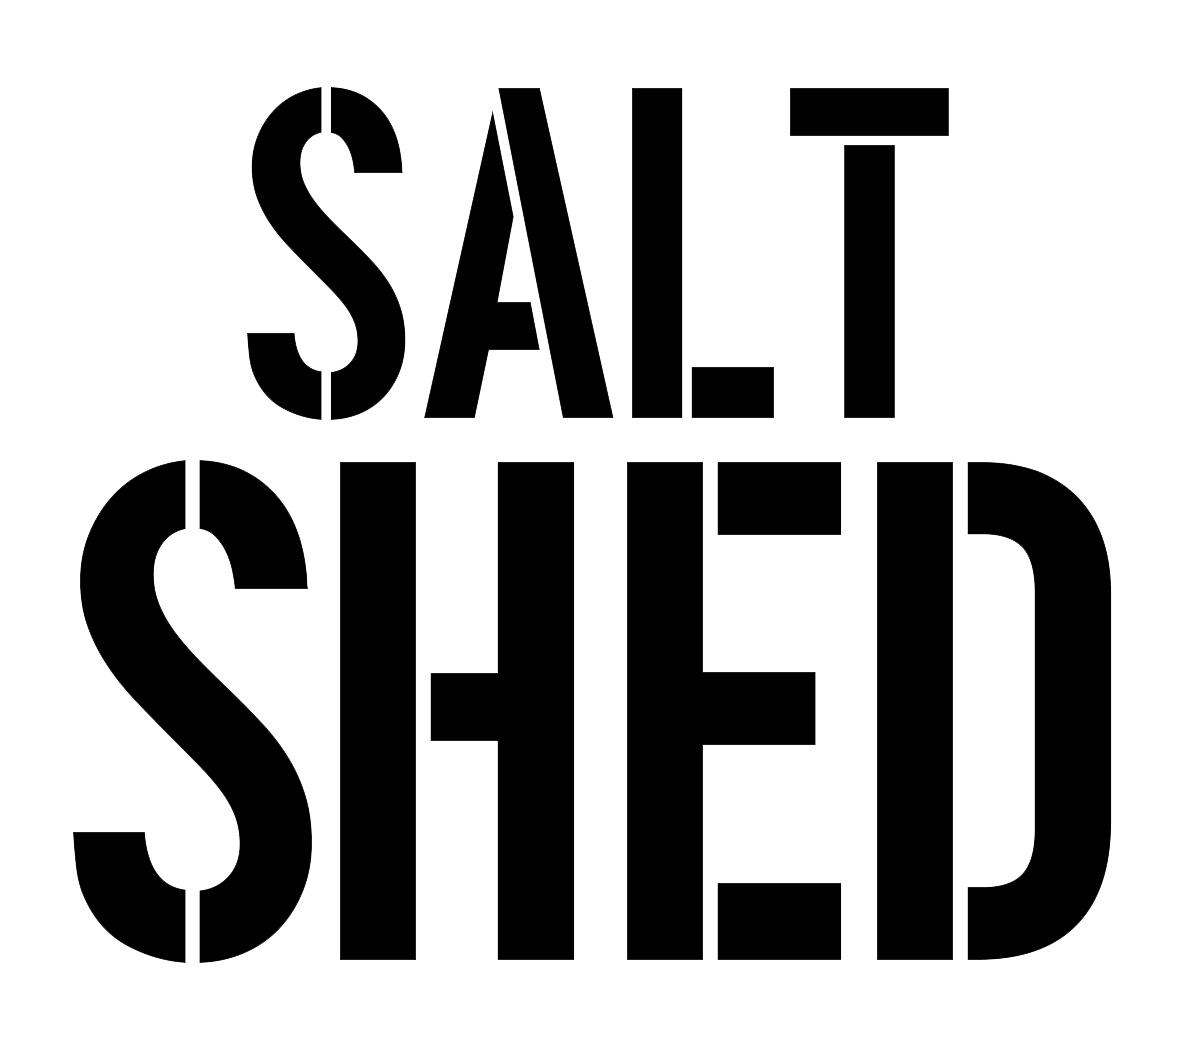 Salt Shed logo Stencil.jpg